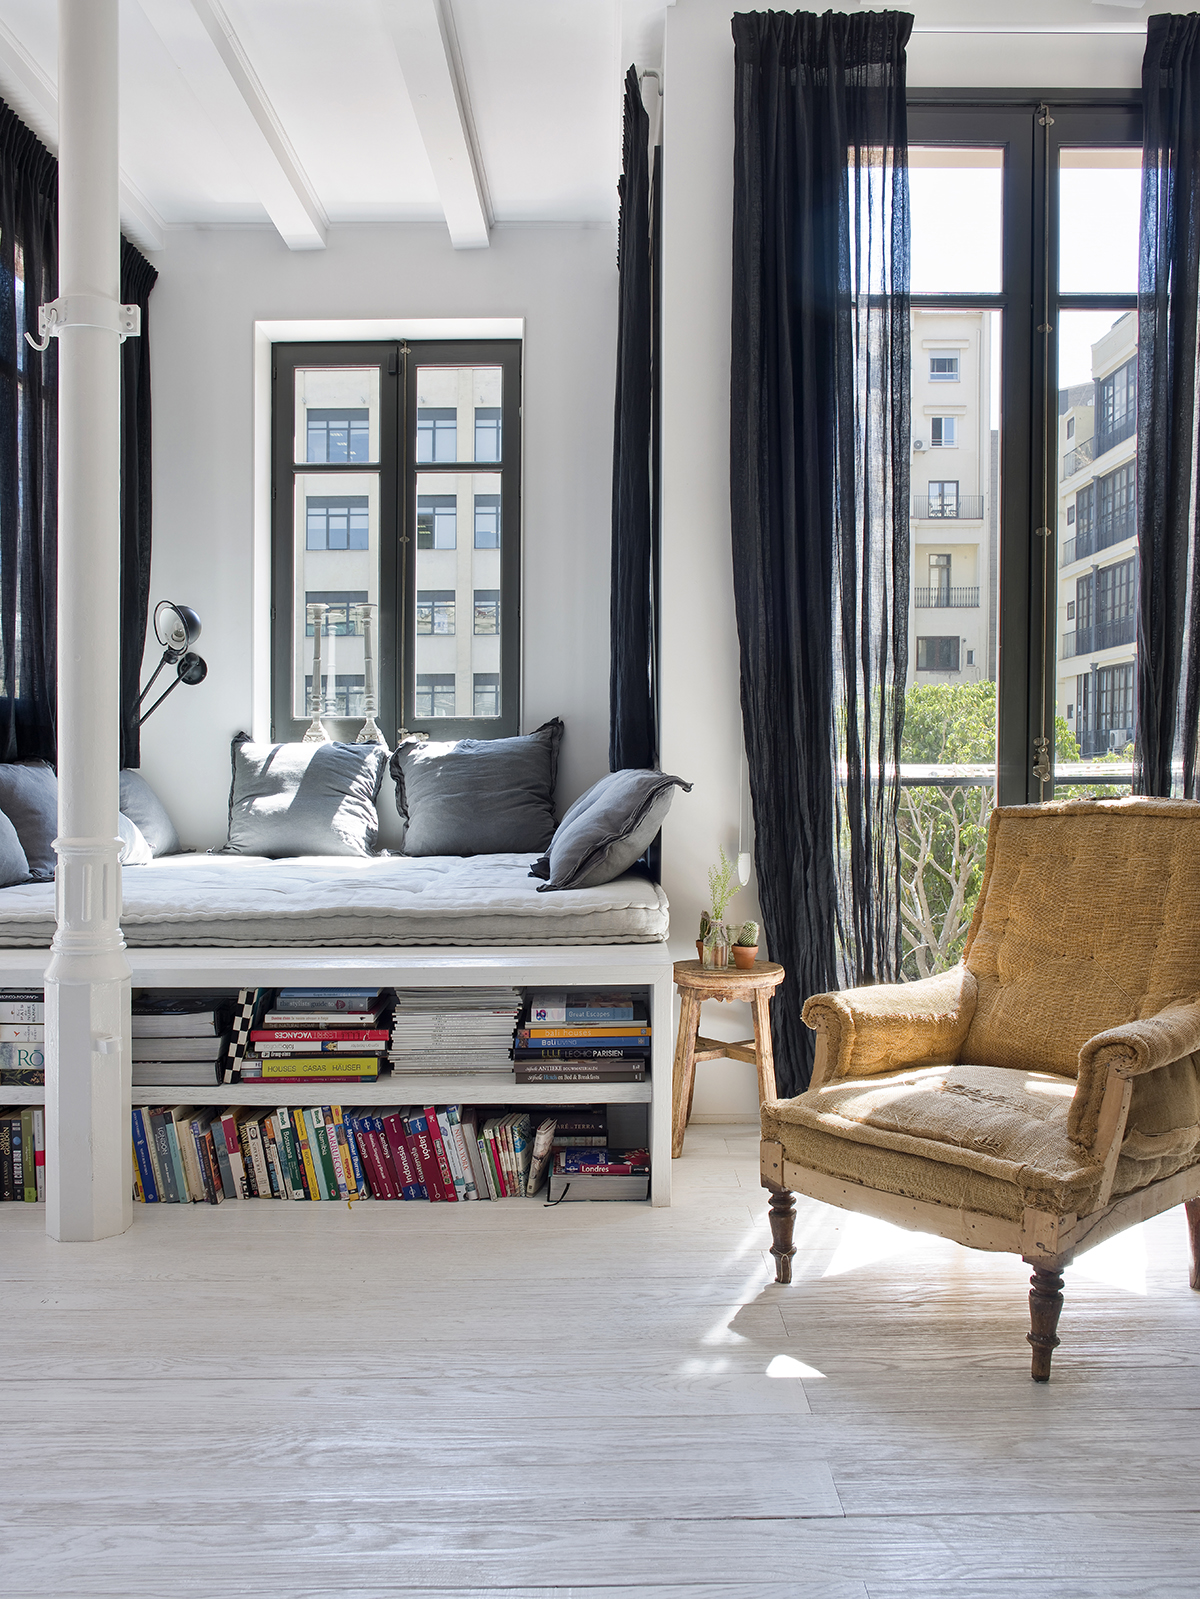 Pokój relaksu przy oknach